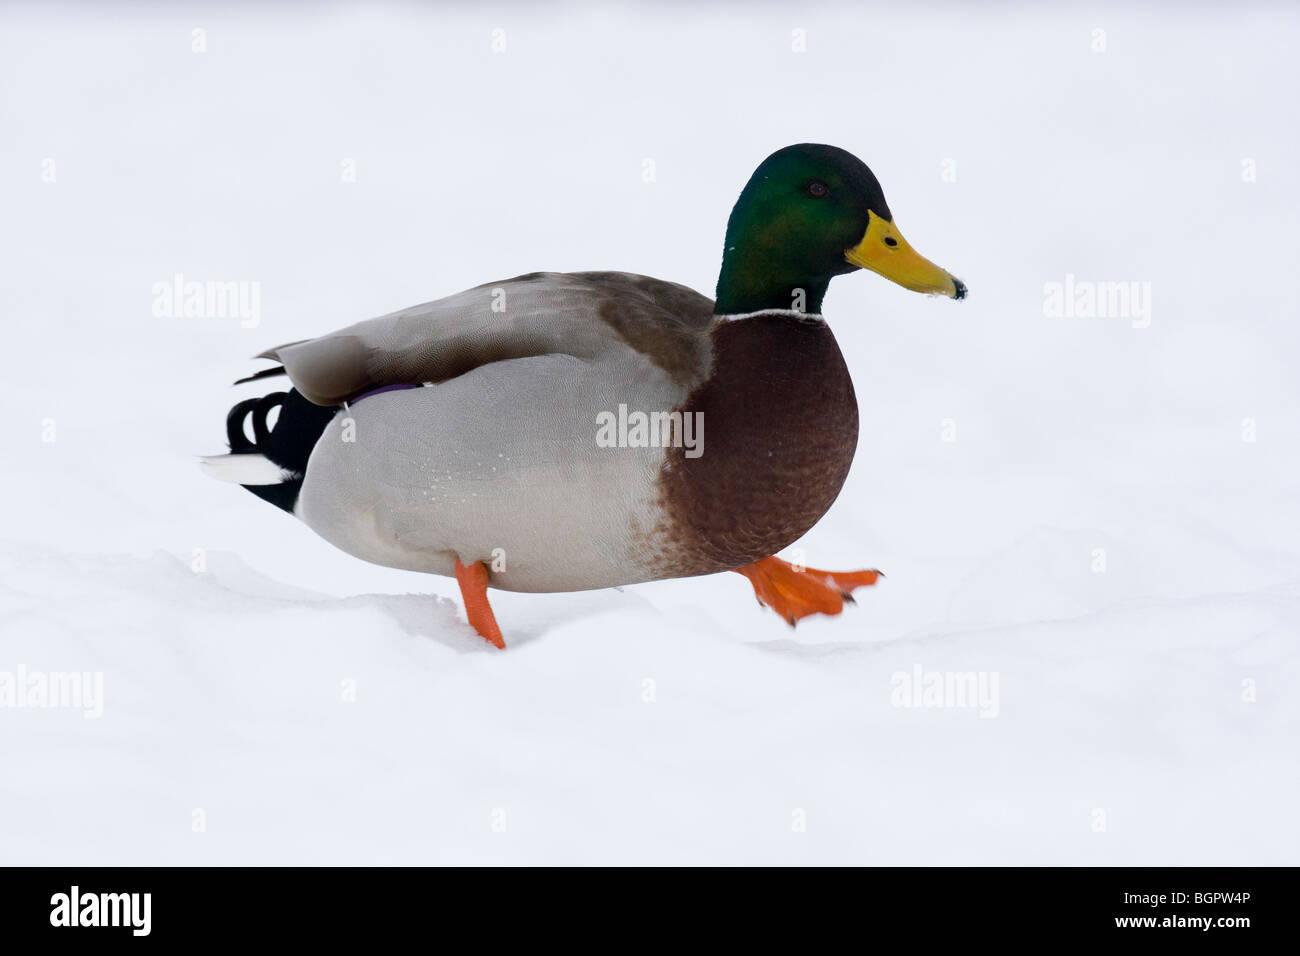 Mallard Anas platyrhynchos walking in snow, Malvern Hills, Worcestershire - Stock Image